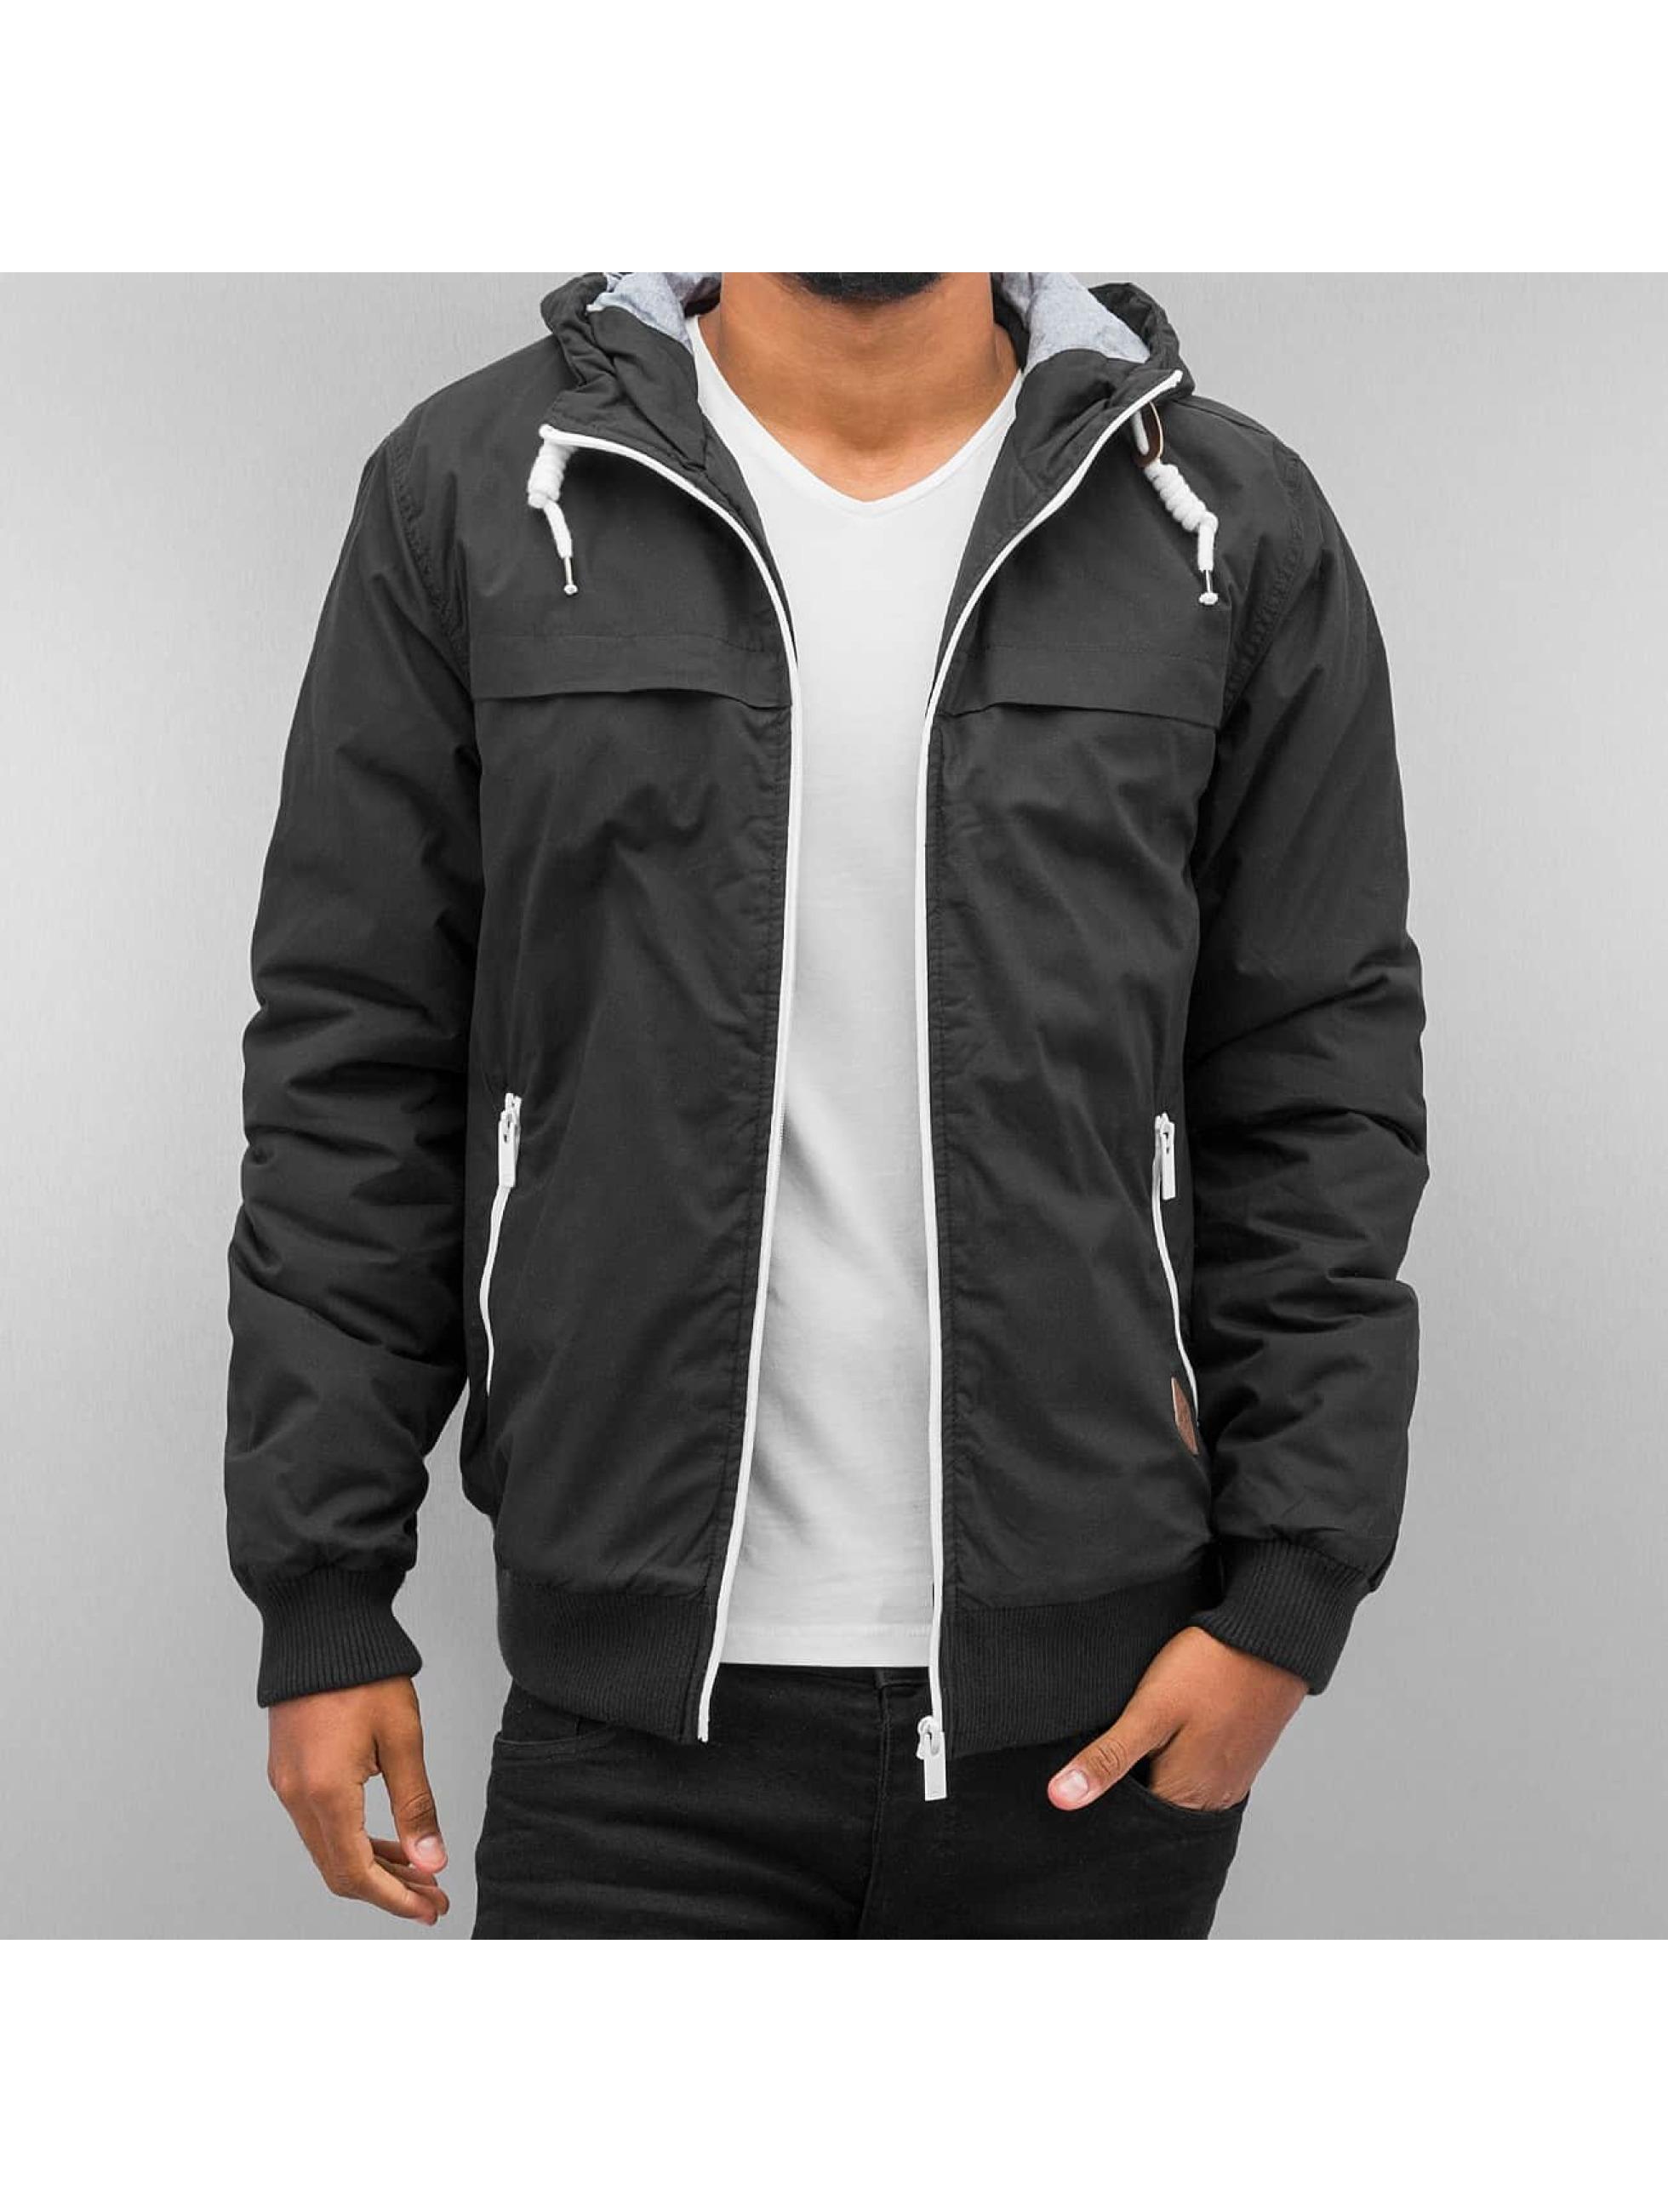 98-86 Winter Jacket Curt black